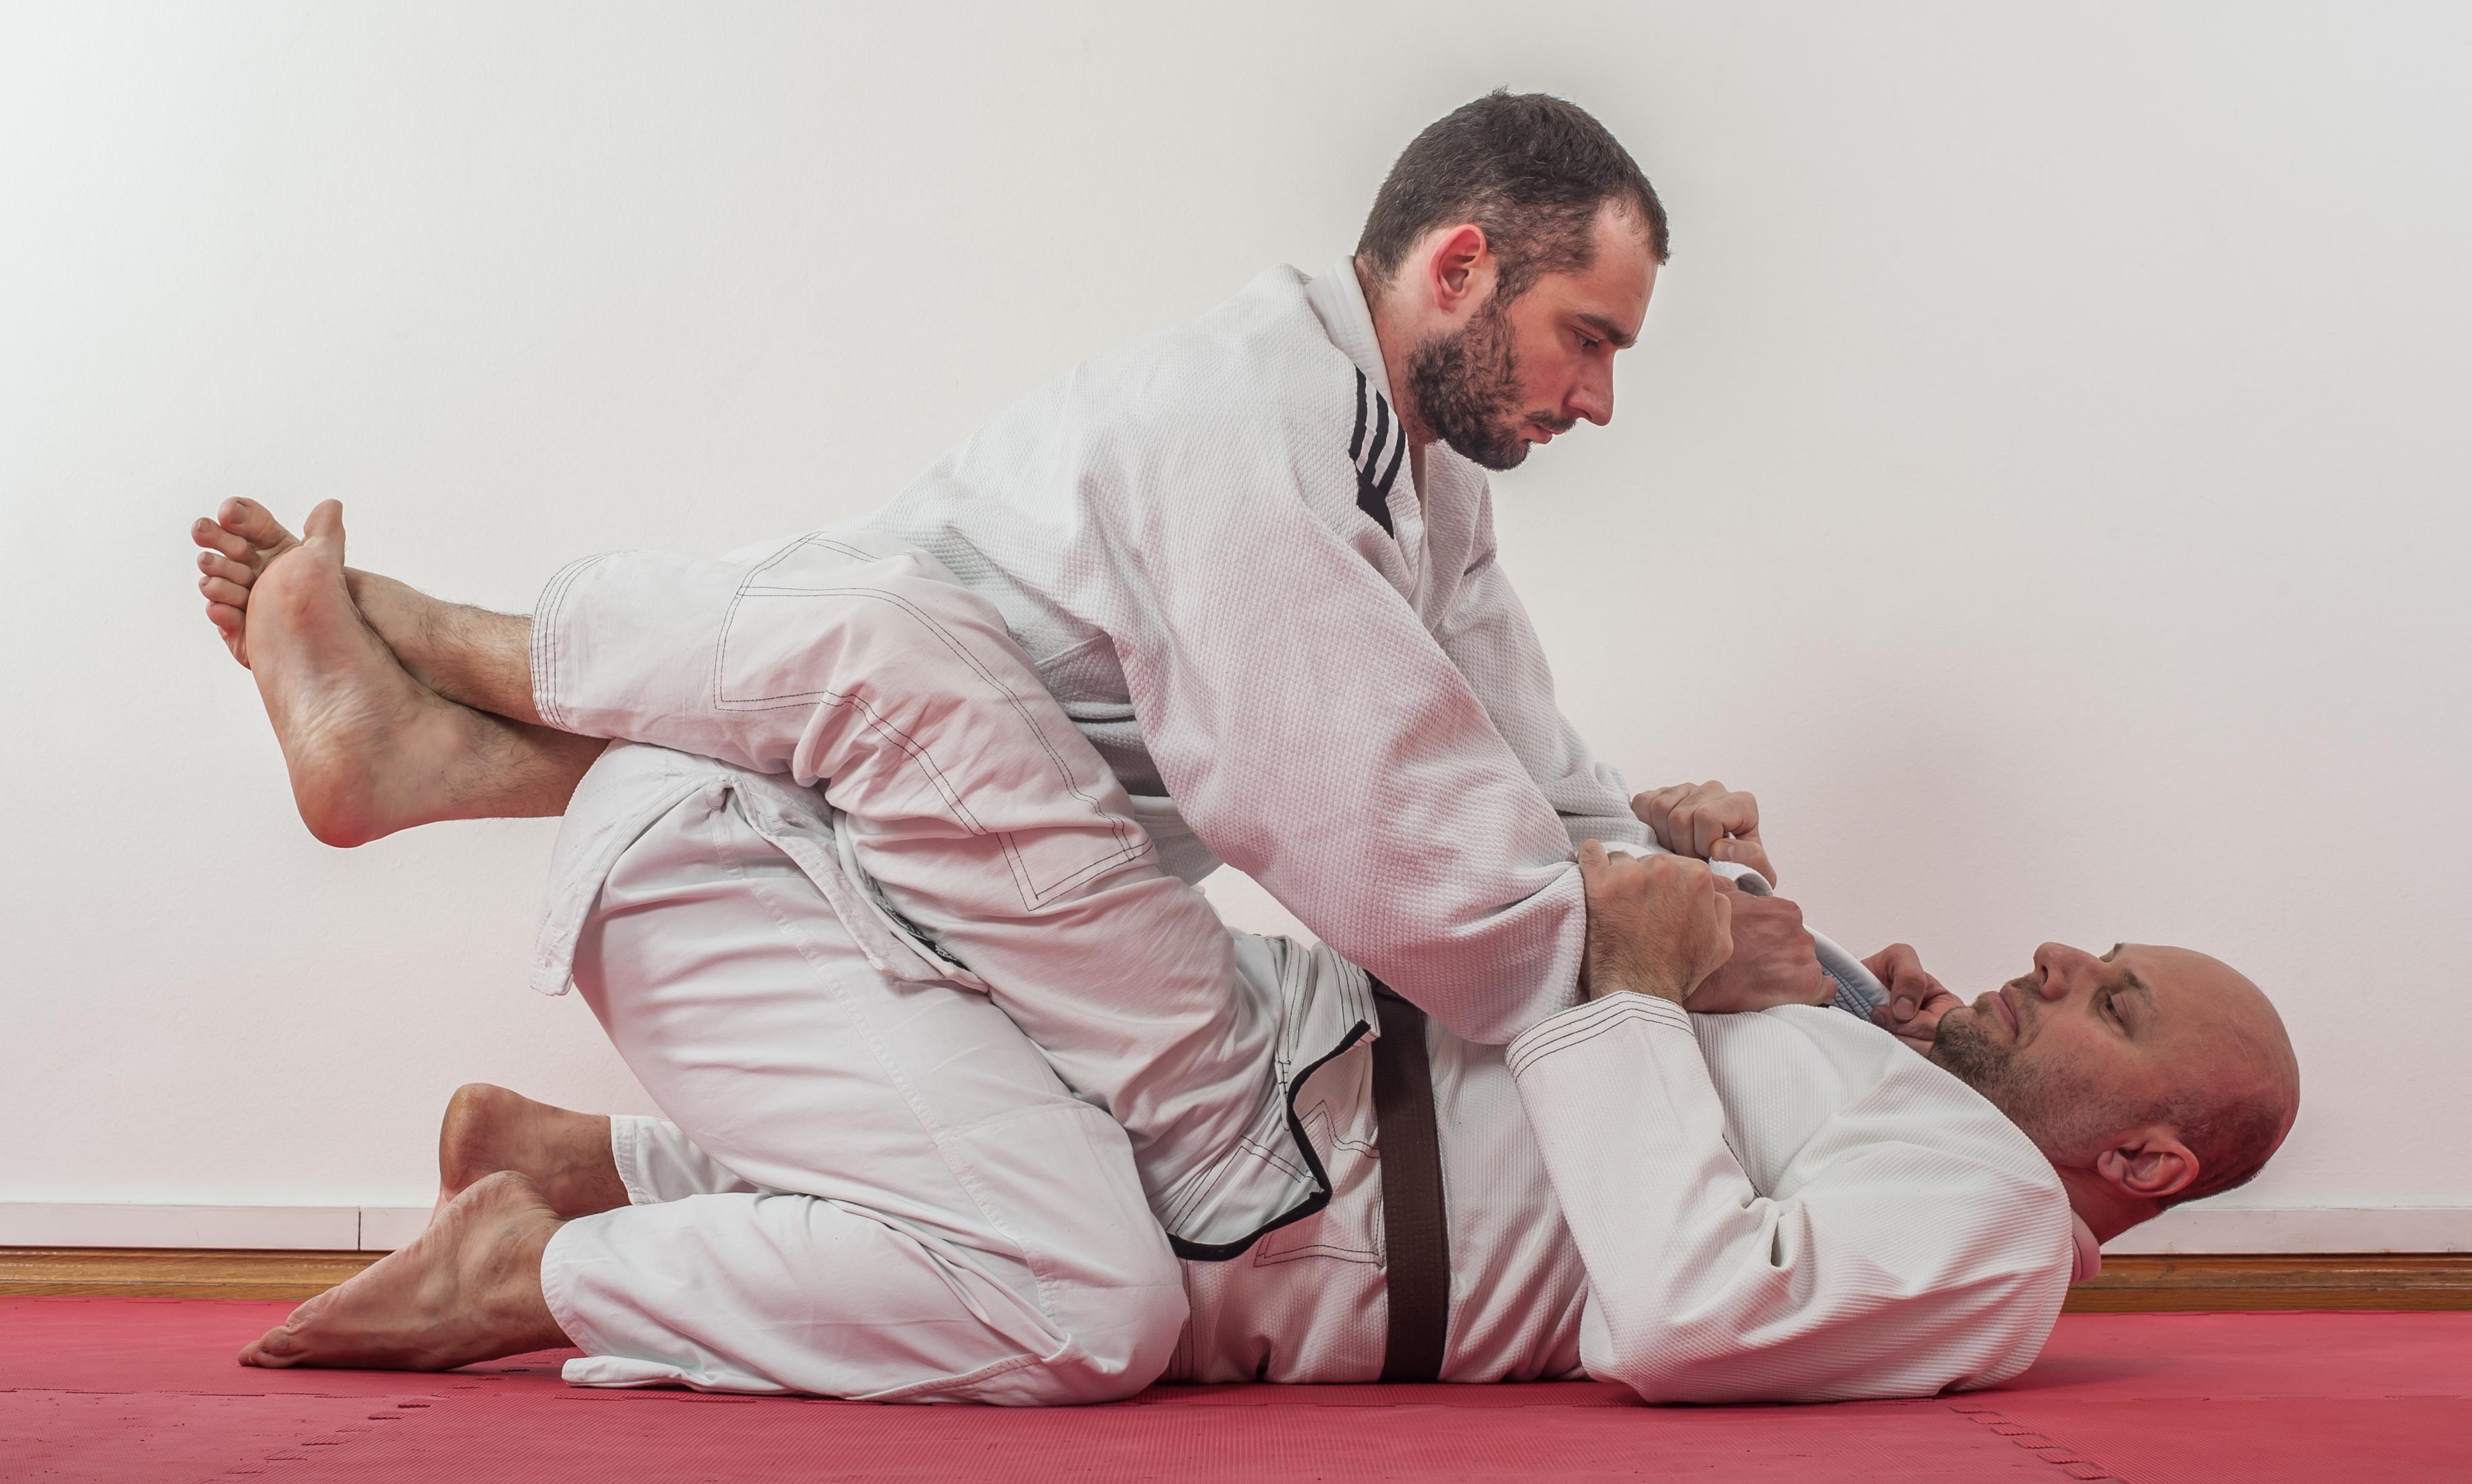 Fitness tips: three benefits of Brazilian jiu-jitsu